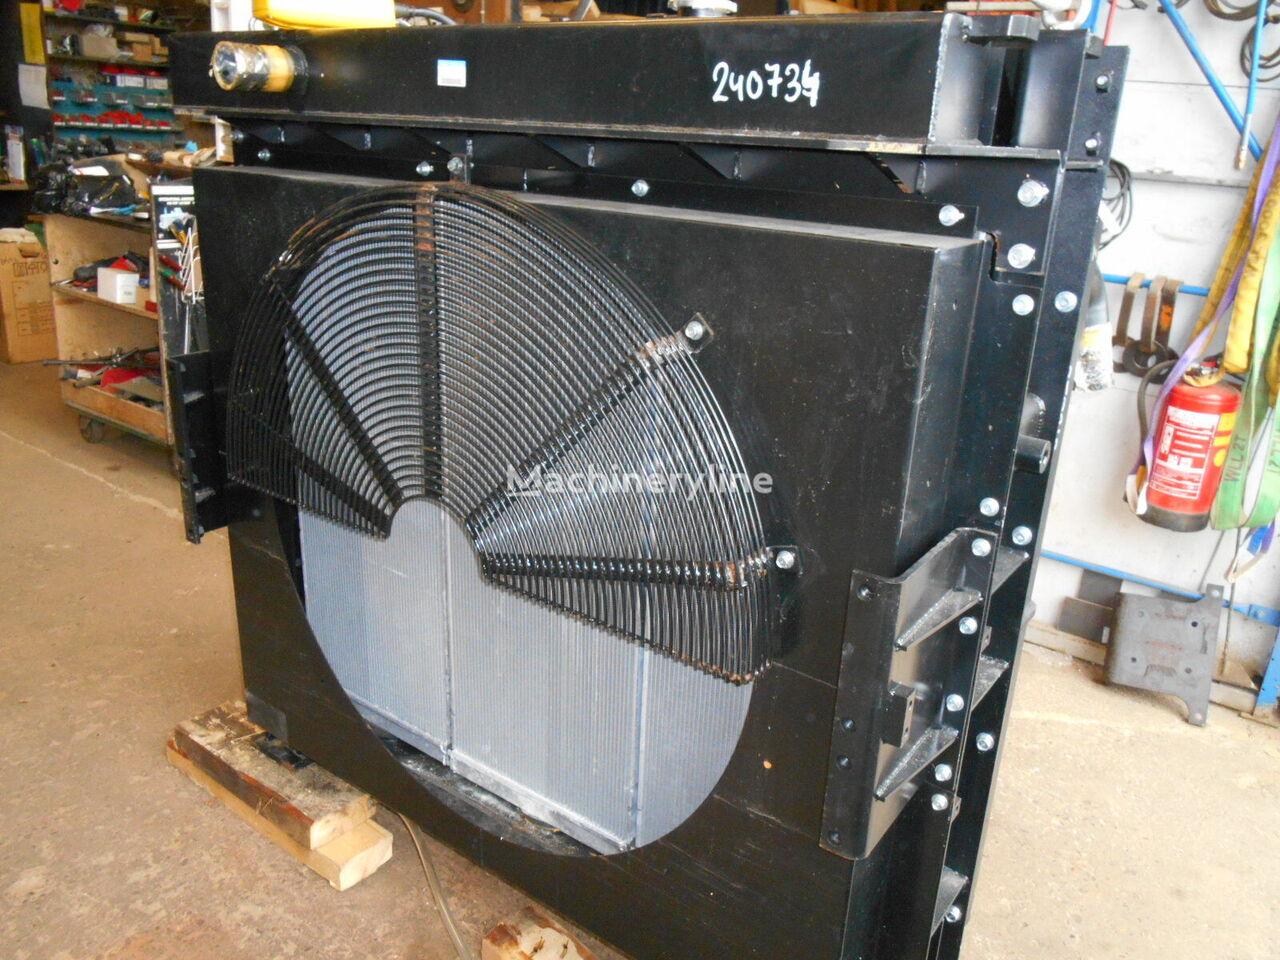 CASE T.Rad 1390-030-0000-A motorkoeling radiator voor CASE CX800B graafmachine